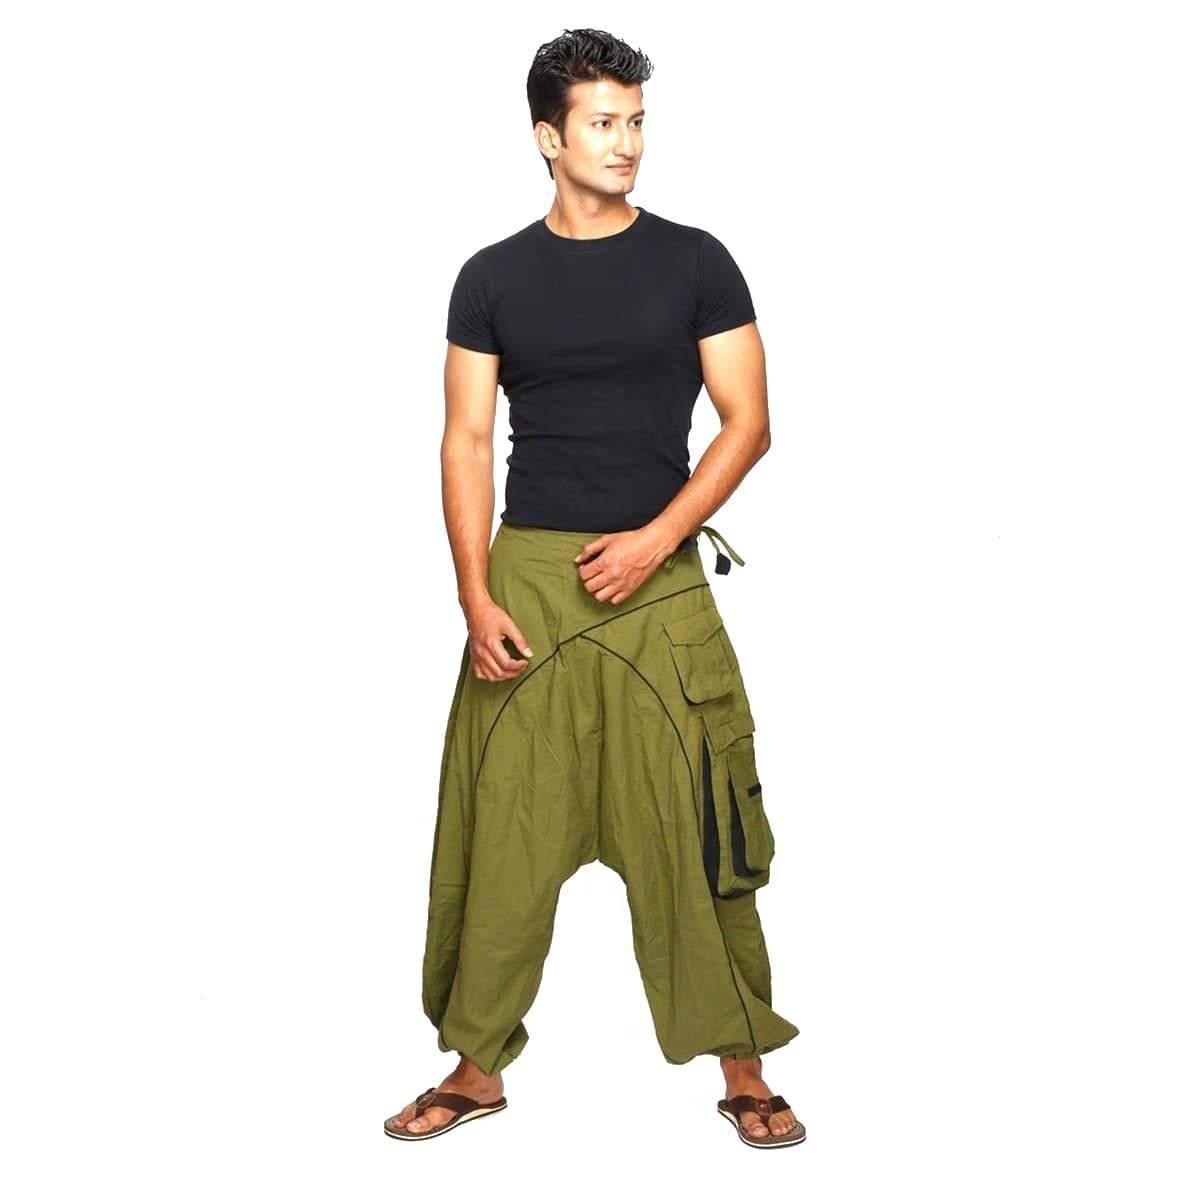 Aladinhose pour homme sarouel unisexe Pantalon bouffant Pluderhose Shalwar Sarouel Goa